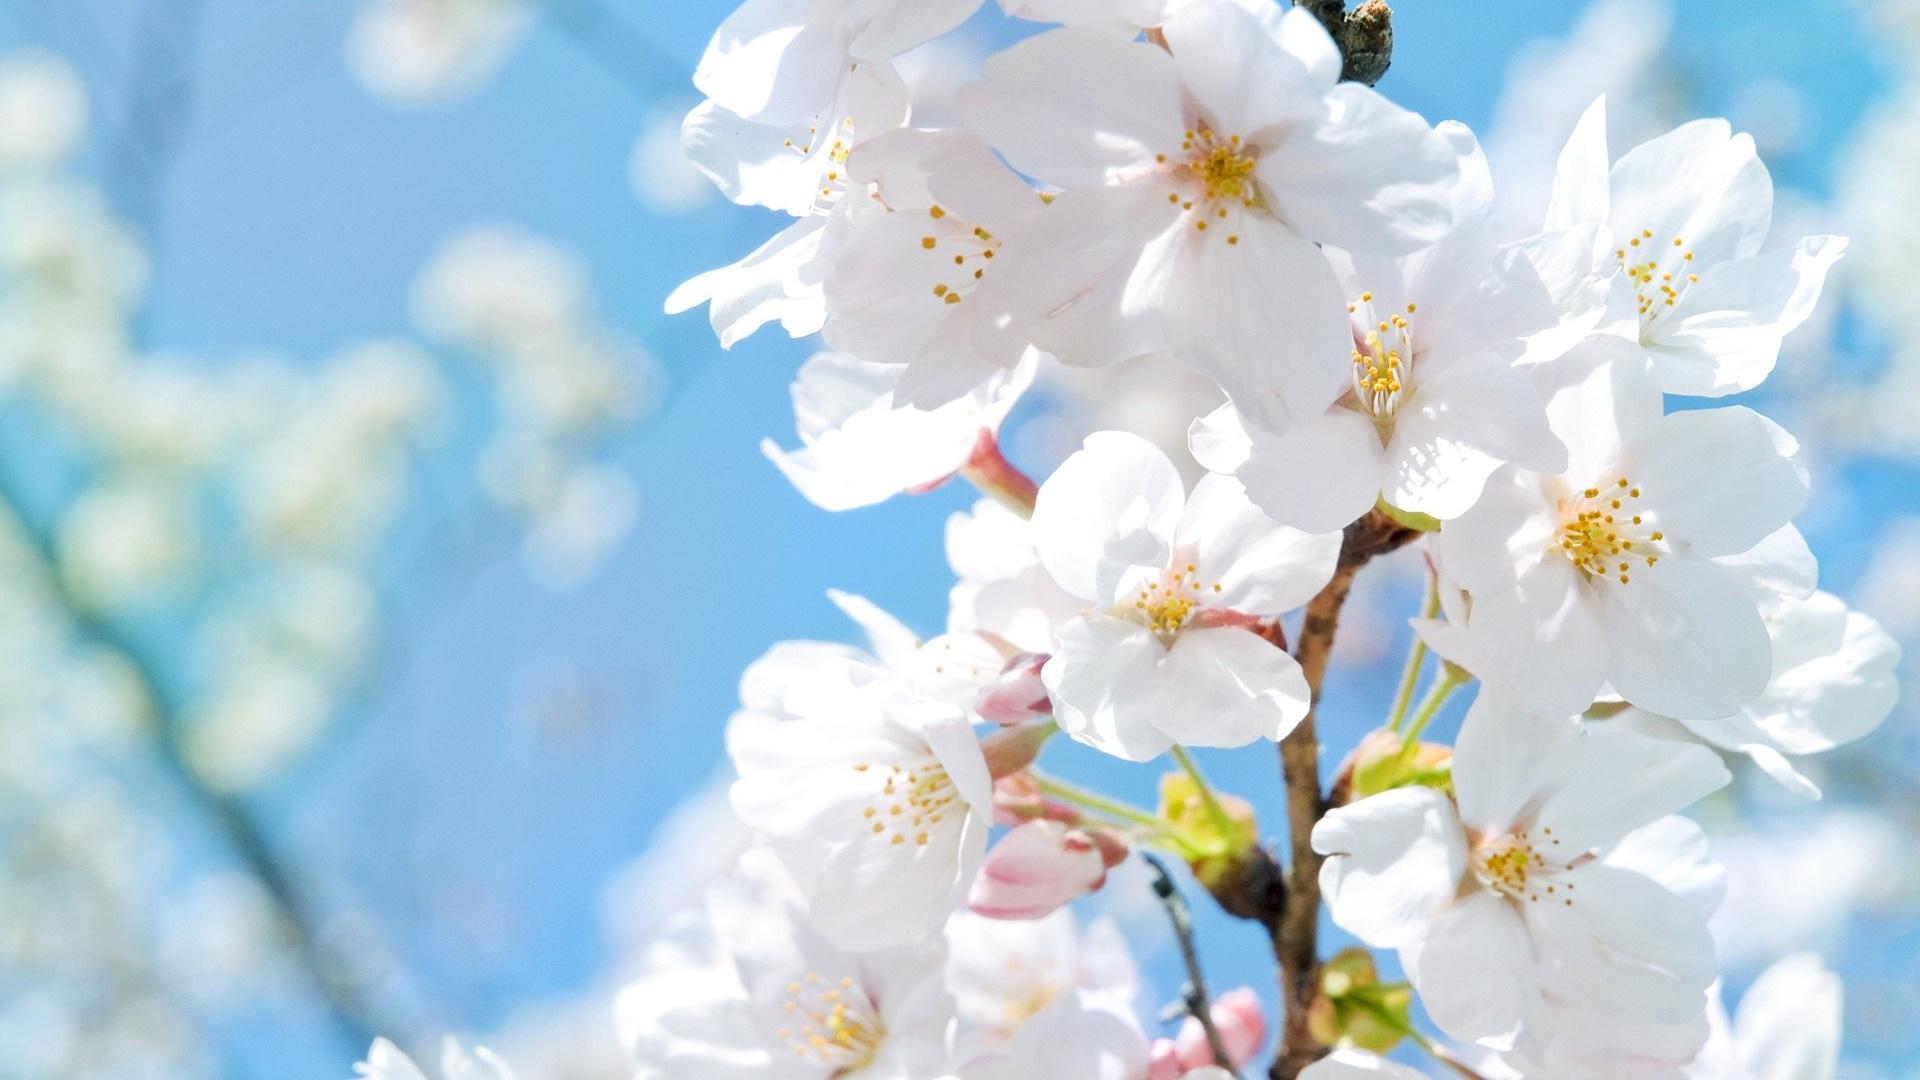 cherry blossom full hd wallpaper